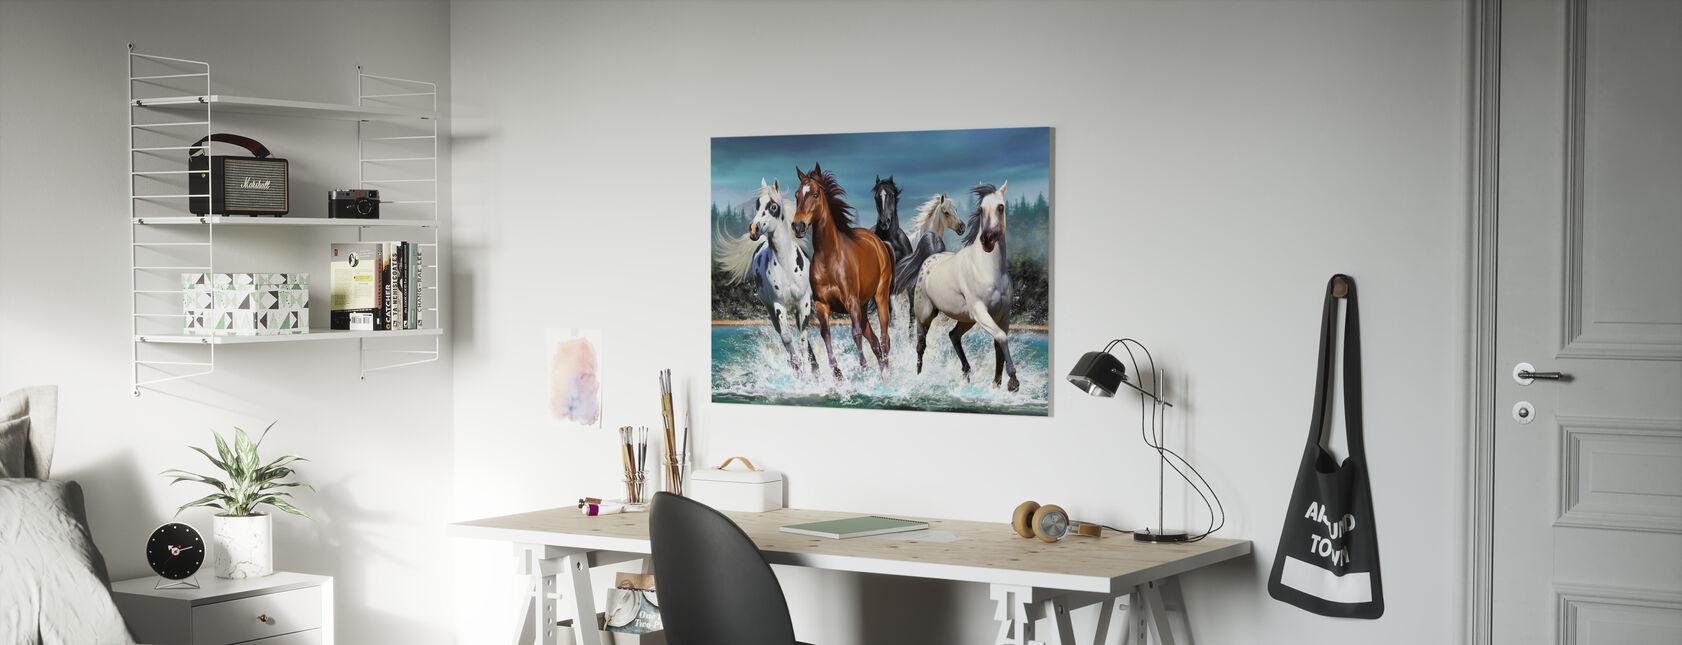 Løpende hester - Lerretsbilde - Barnerom